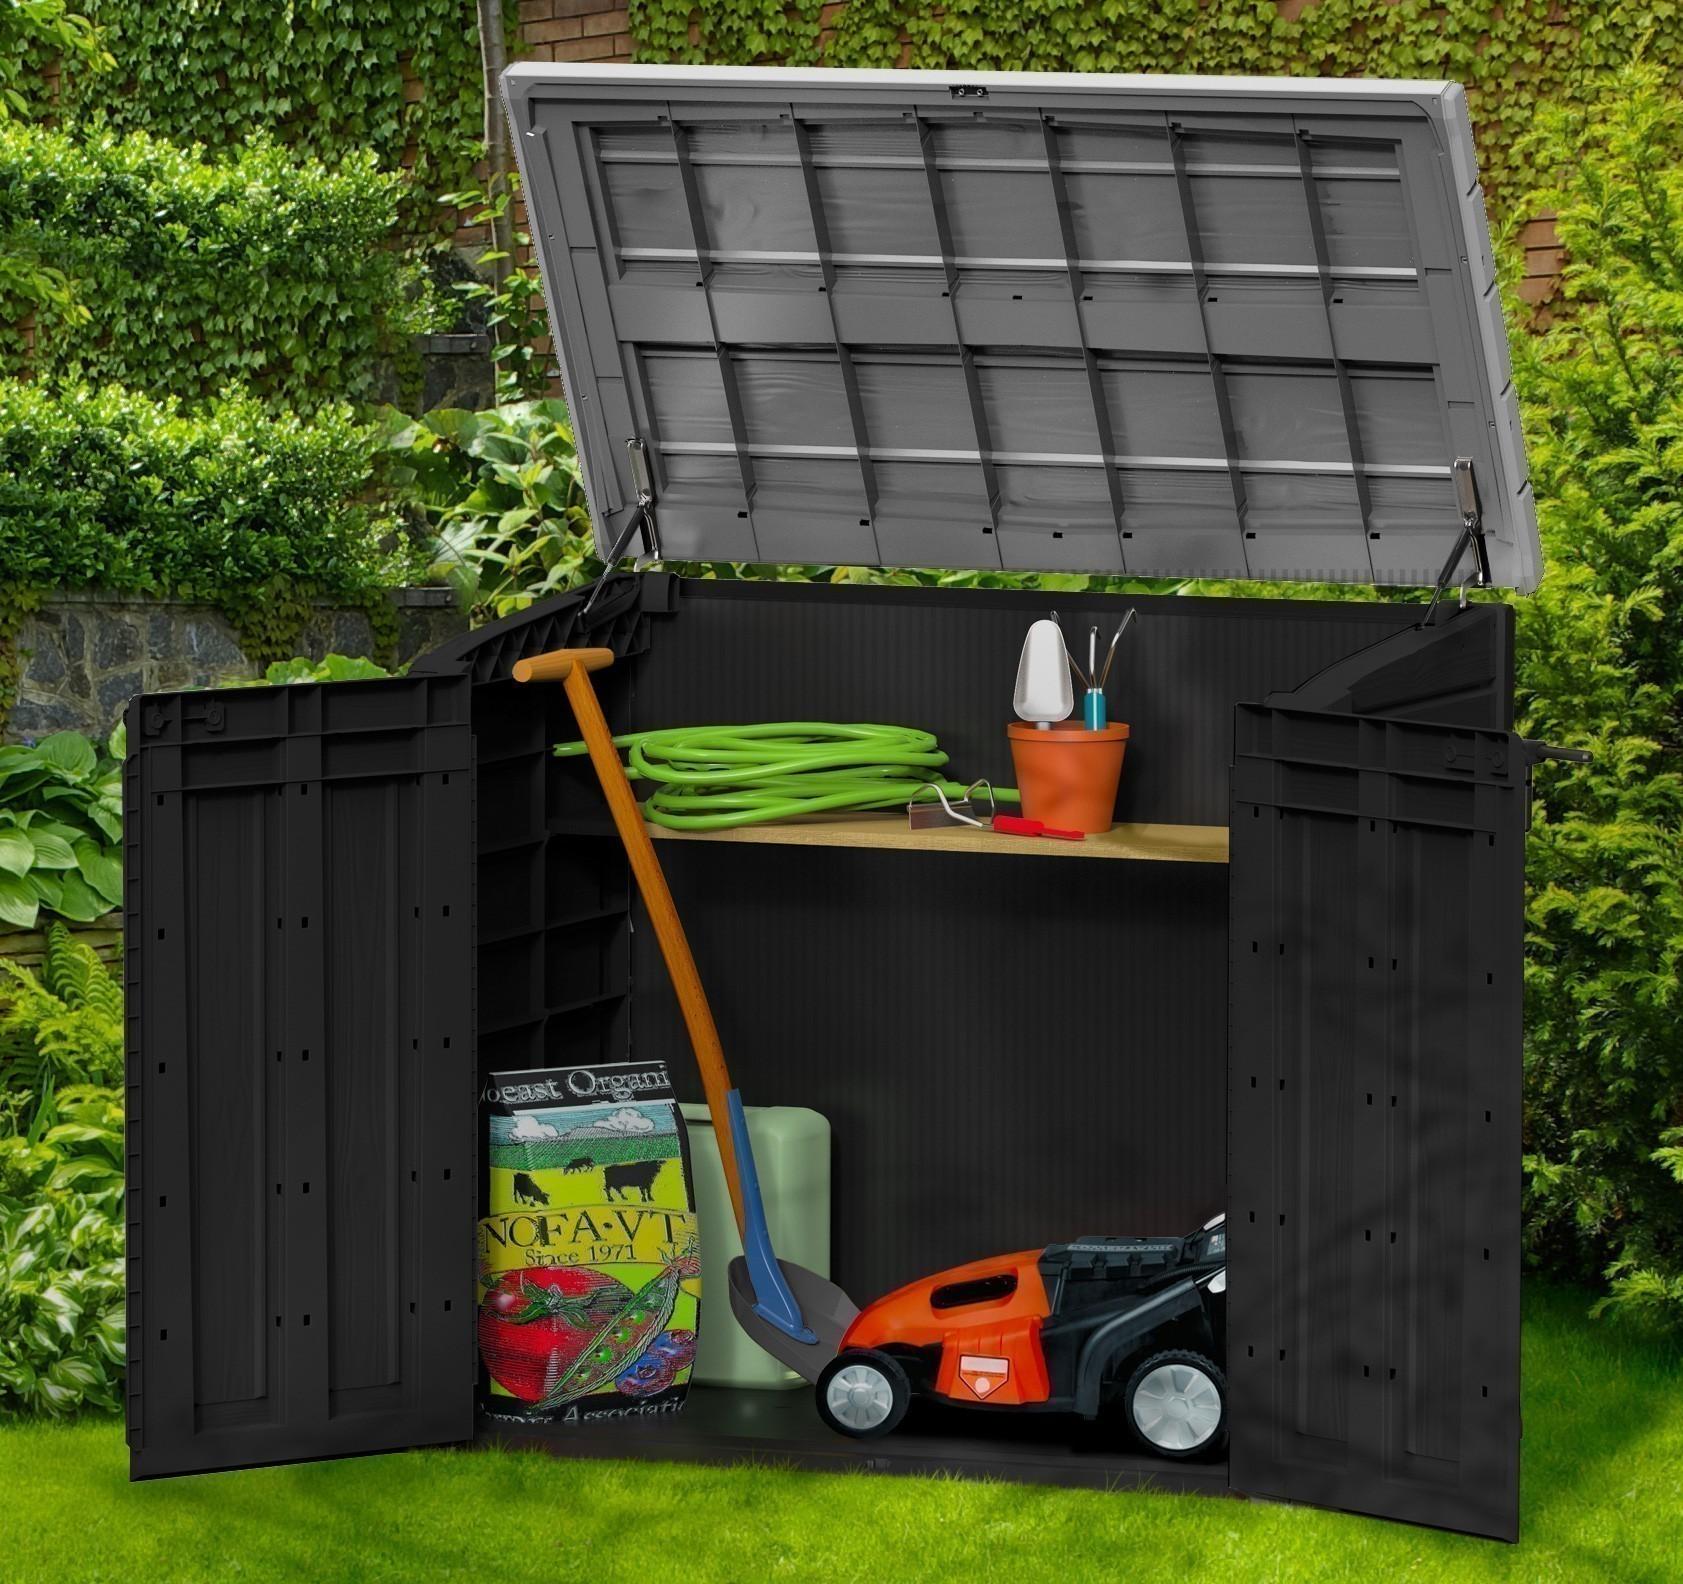 gartenbox aufbewahrungsbox store it out tepro